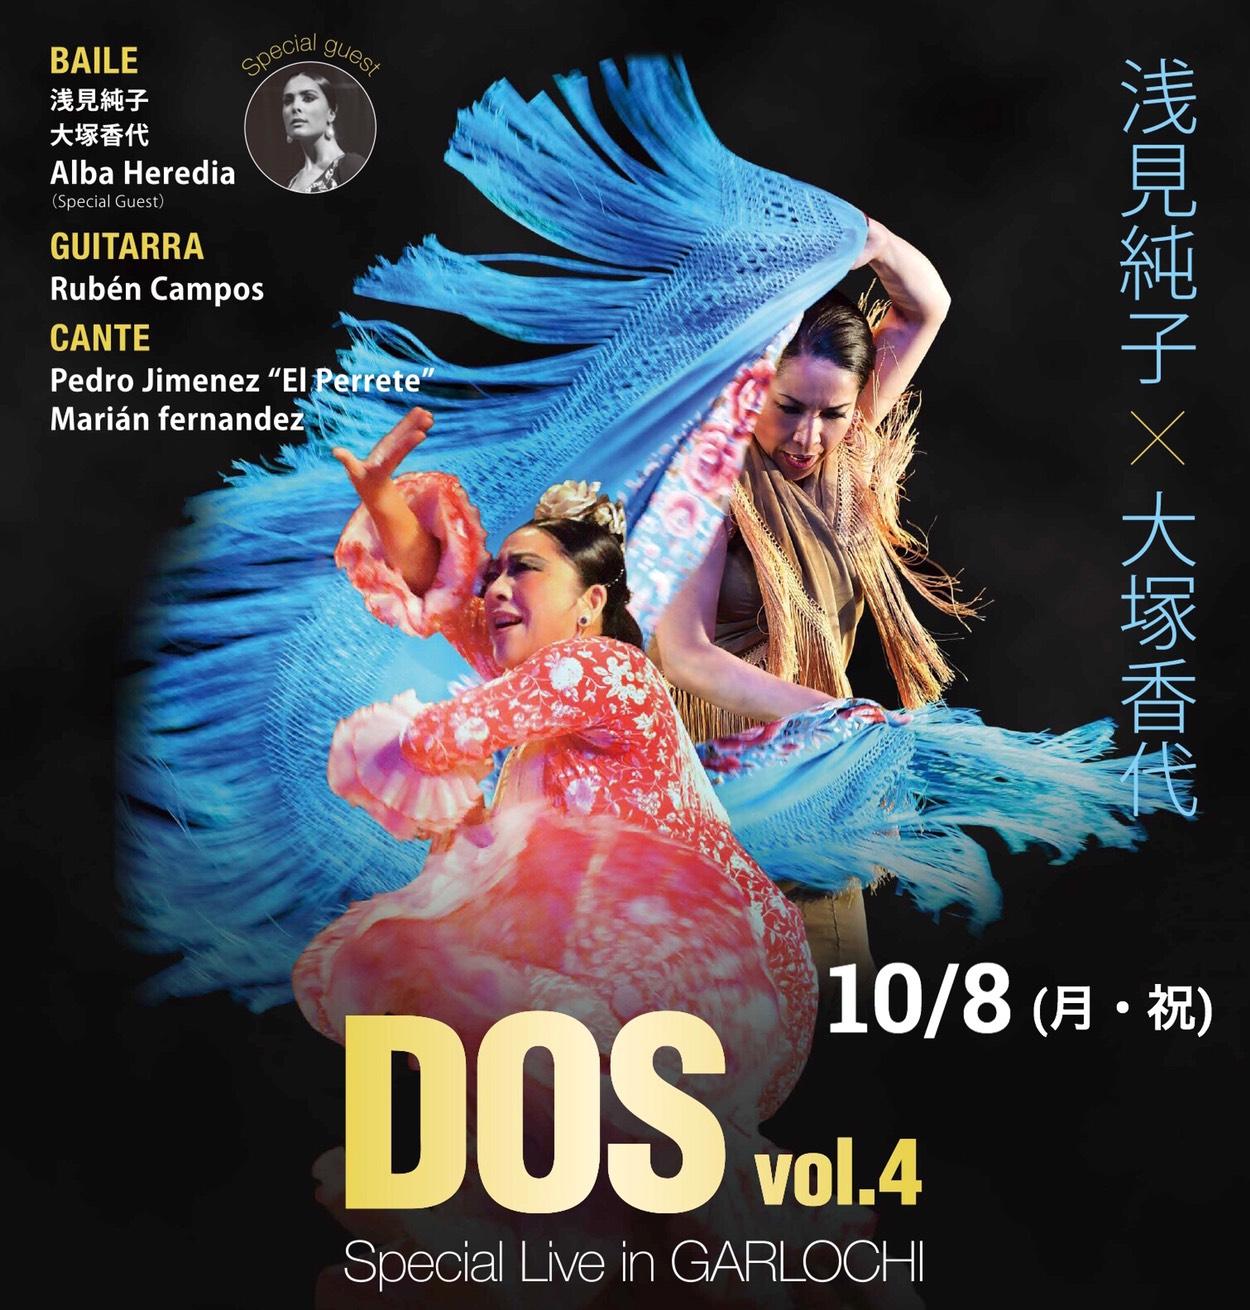 『DOS Special Live in GARLOCHI』 浅見純子×大塚香代 Special guest Alba Heredia